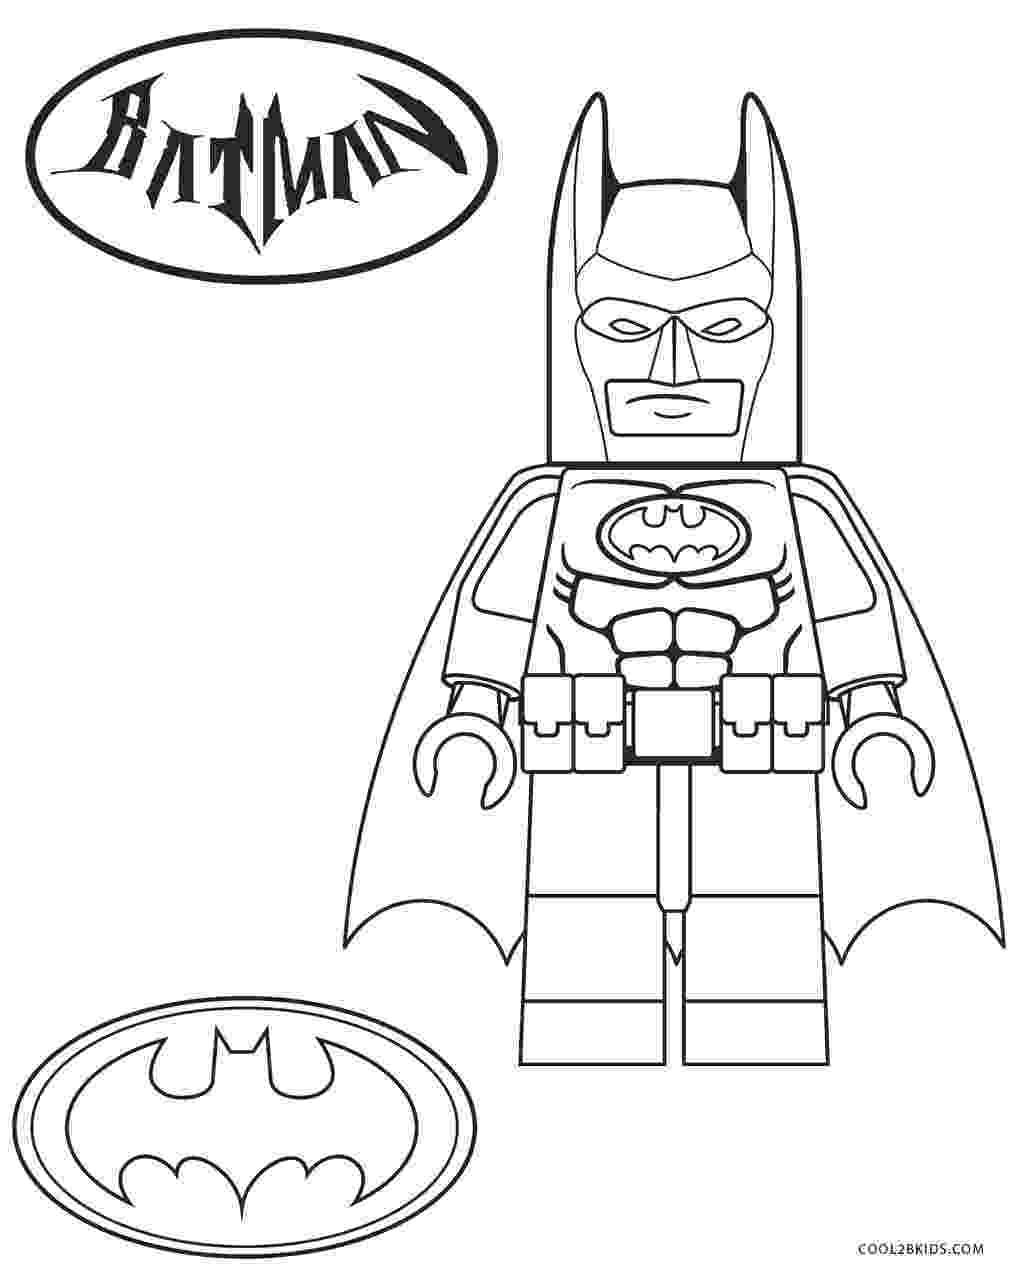 lego batman colouring lego robin coloring page free printable coloring pages colouring lego batman